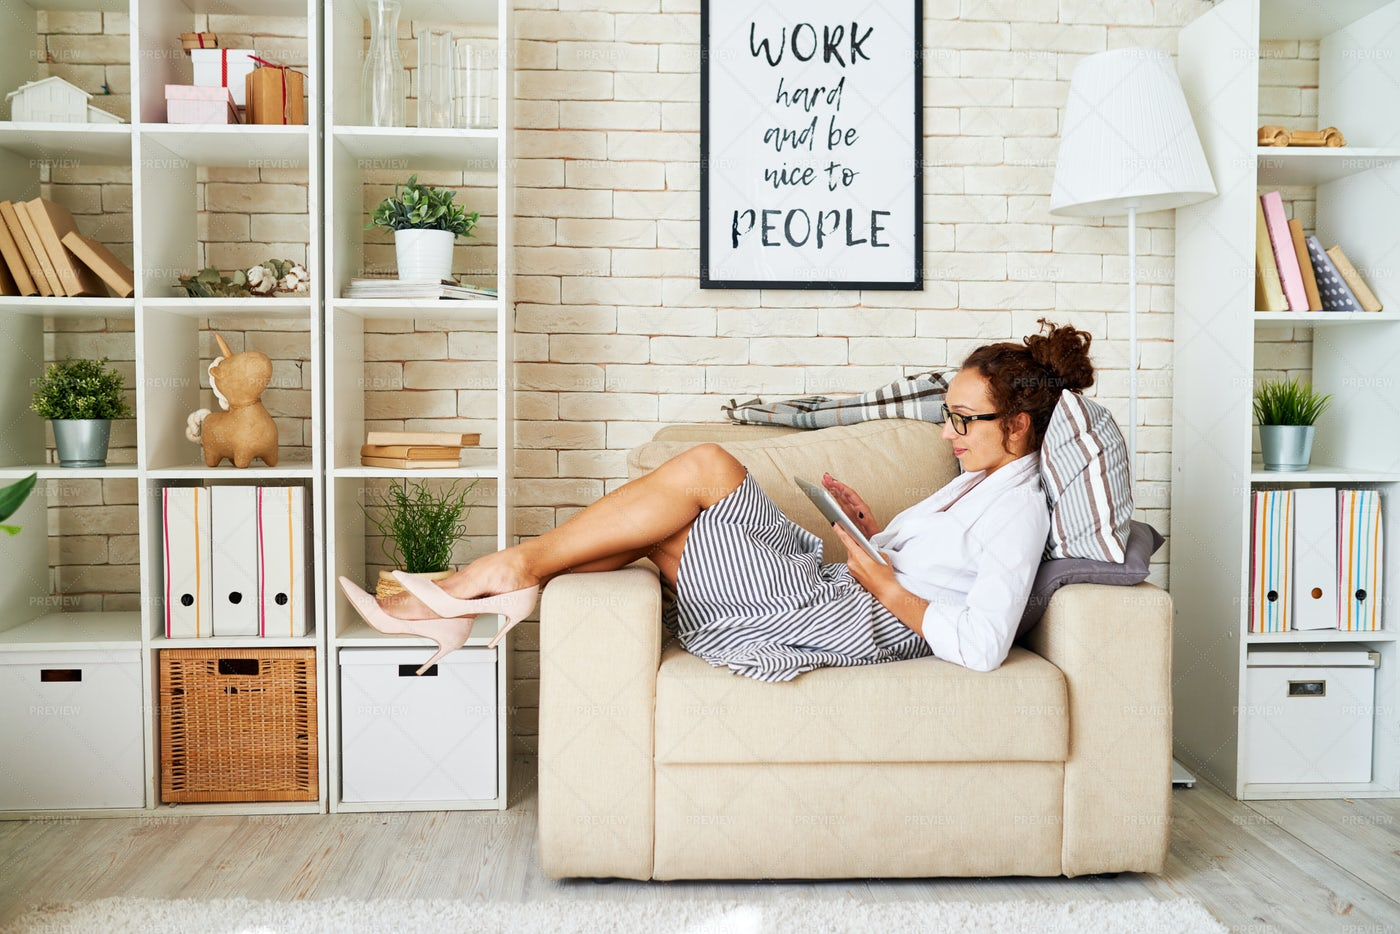 Business Woman Taking A Break: Stock Photos